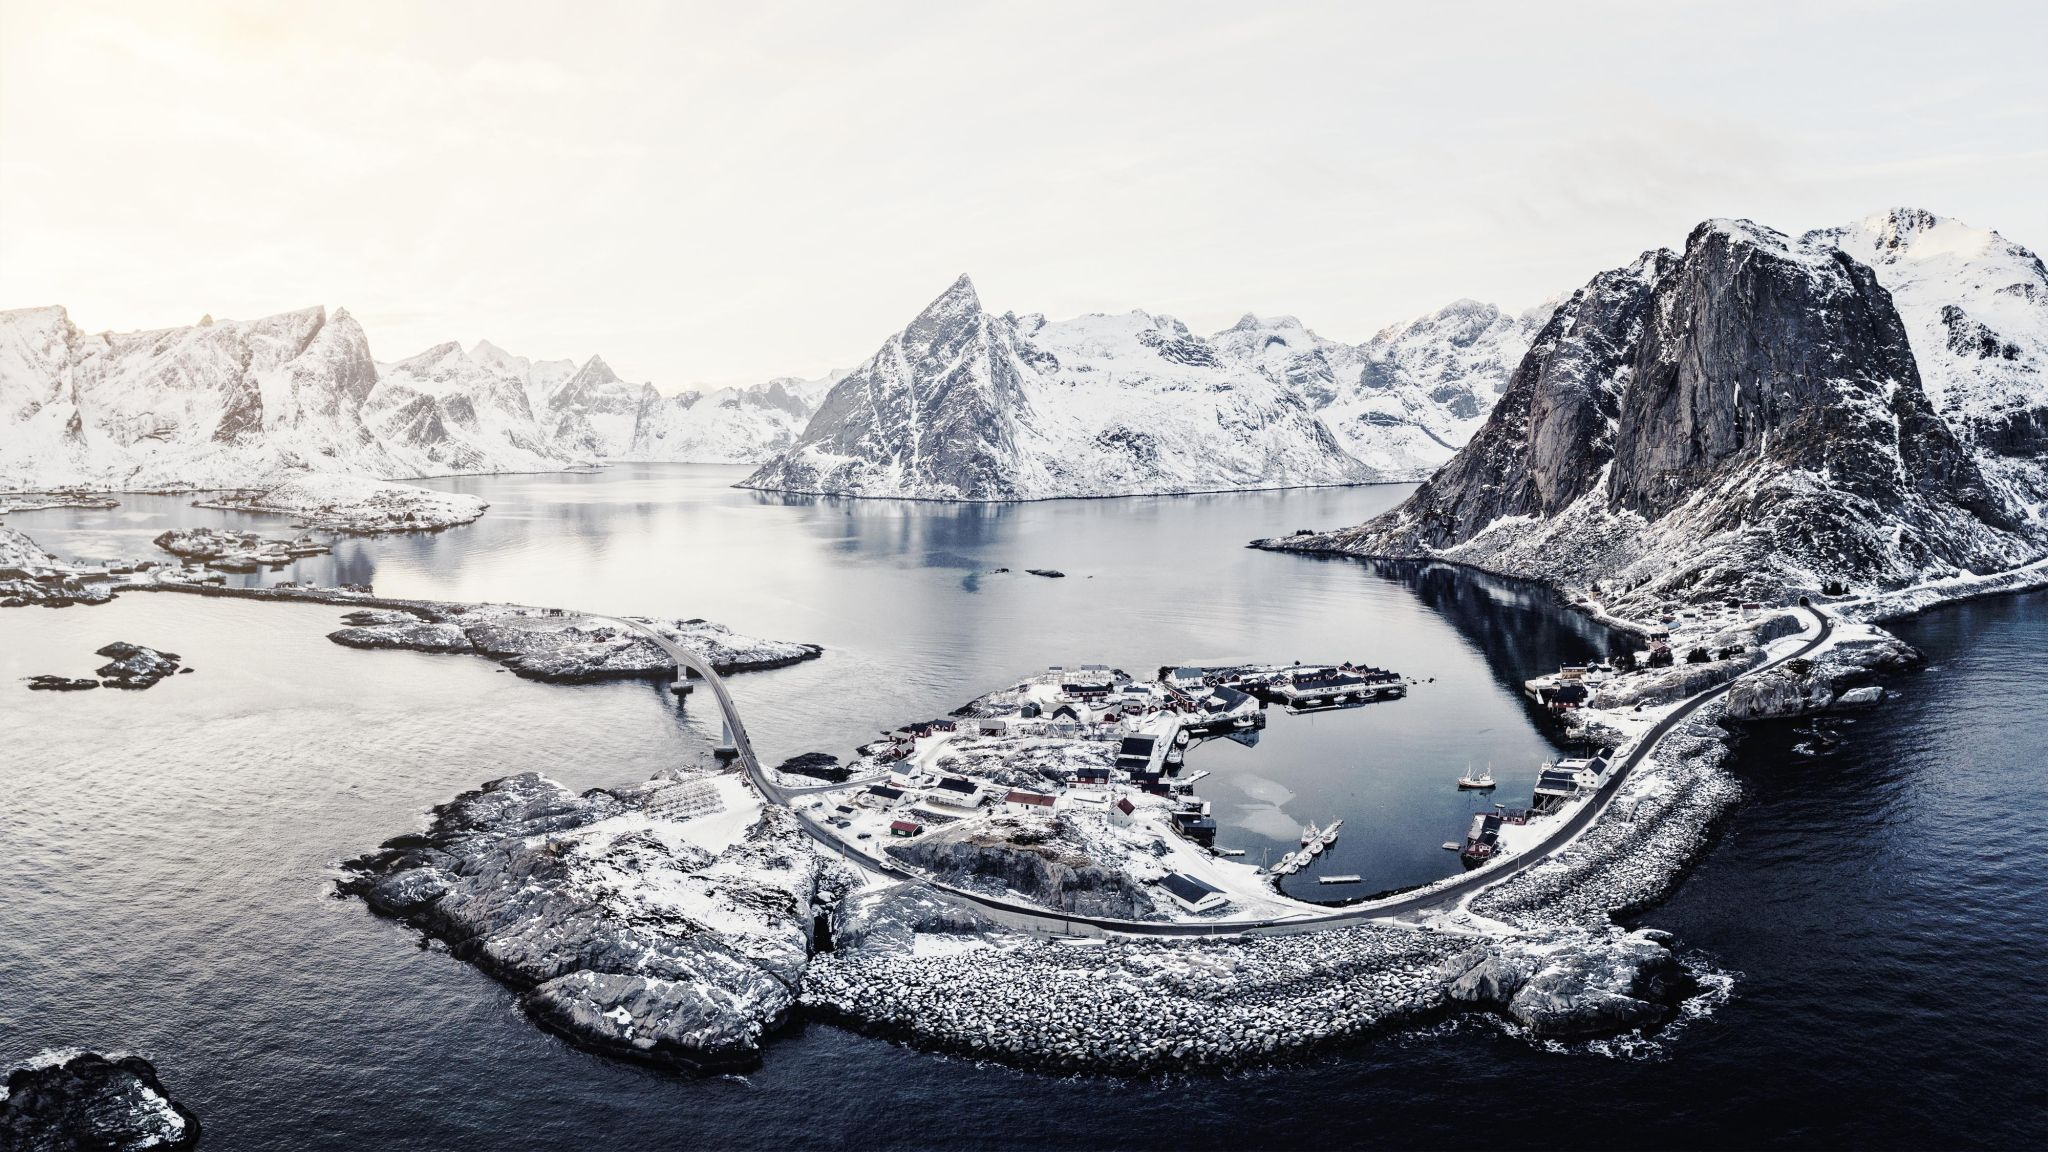 Bird View of Hamnoya, Lofoten, Norway